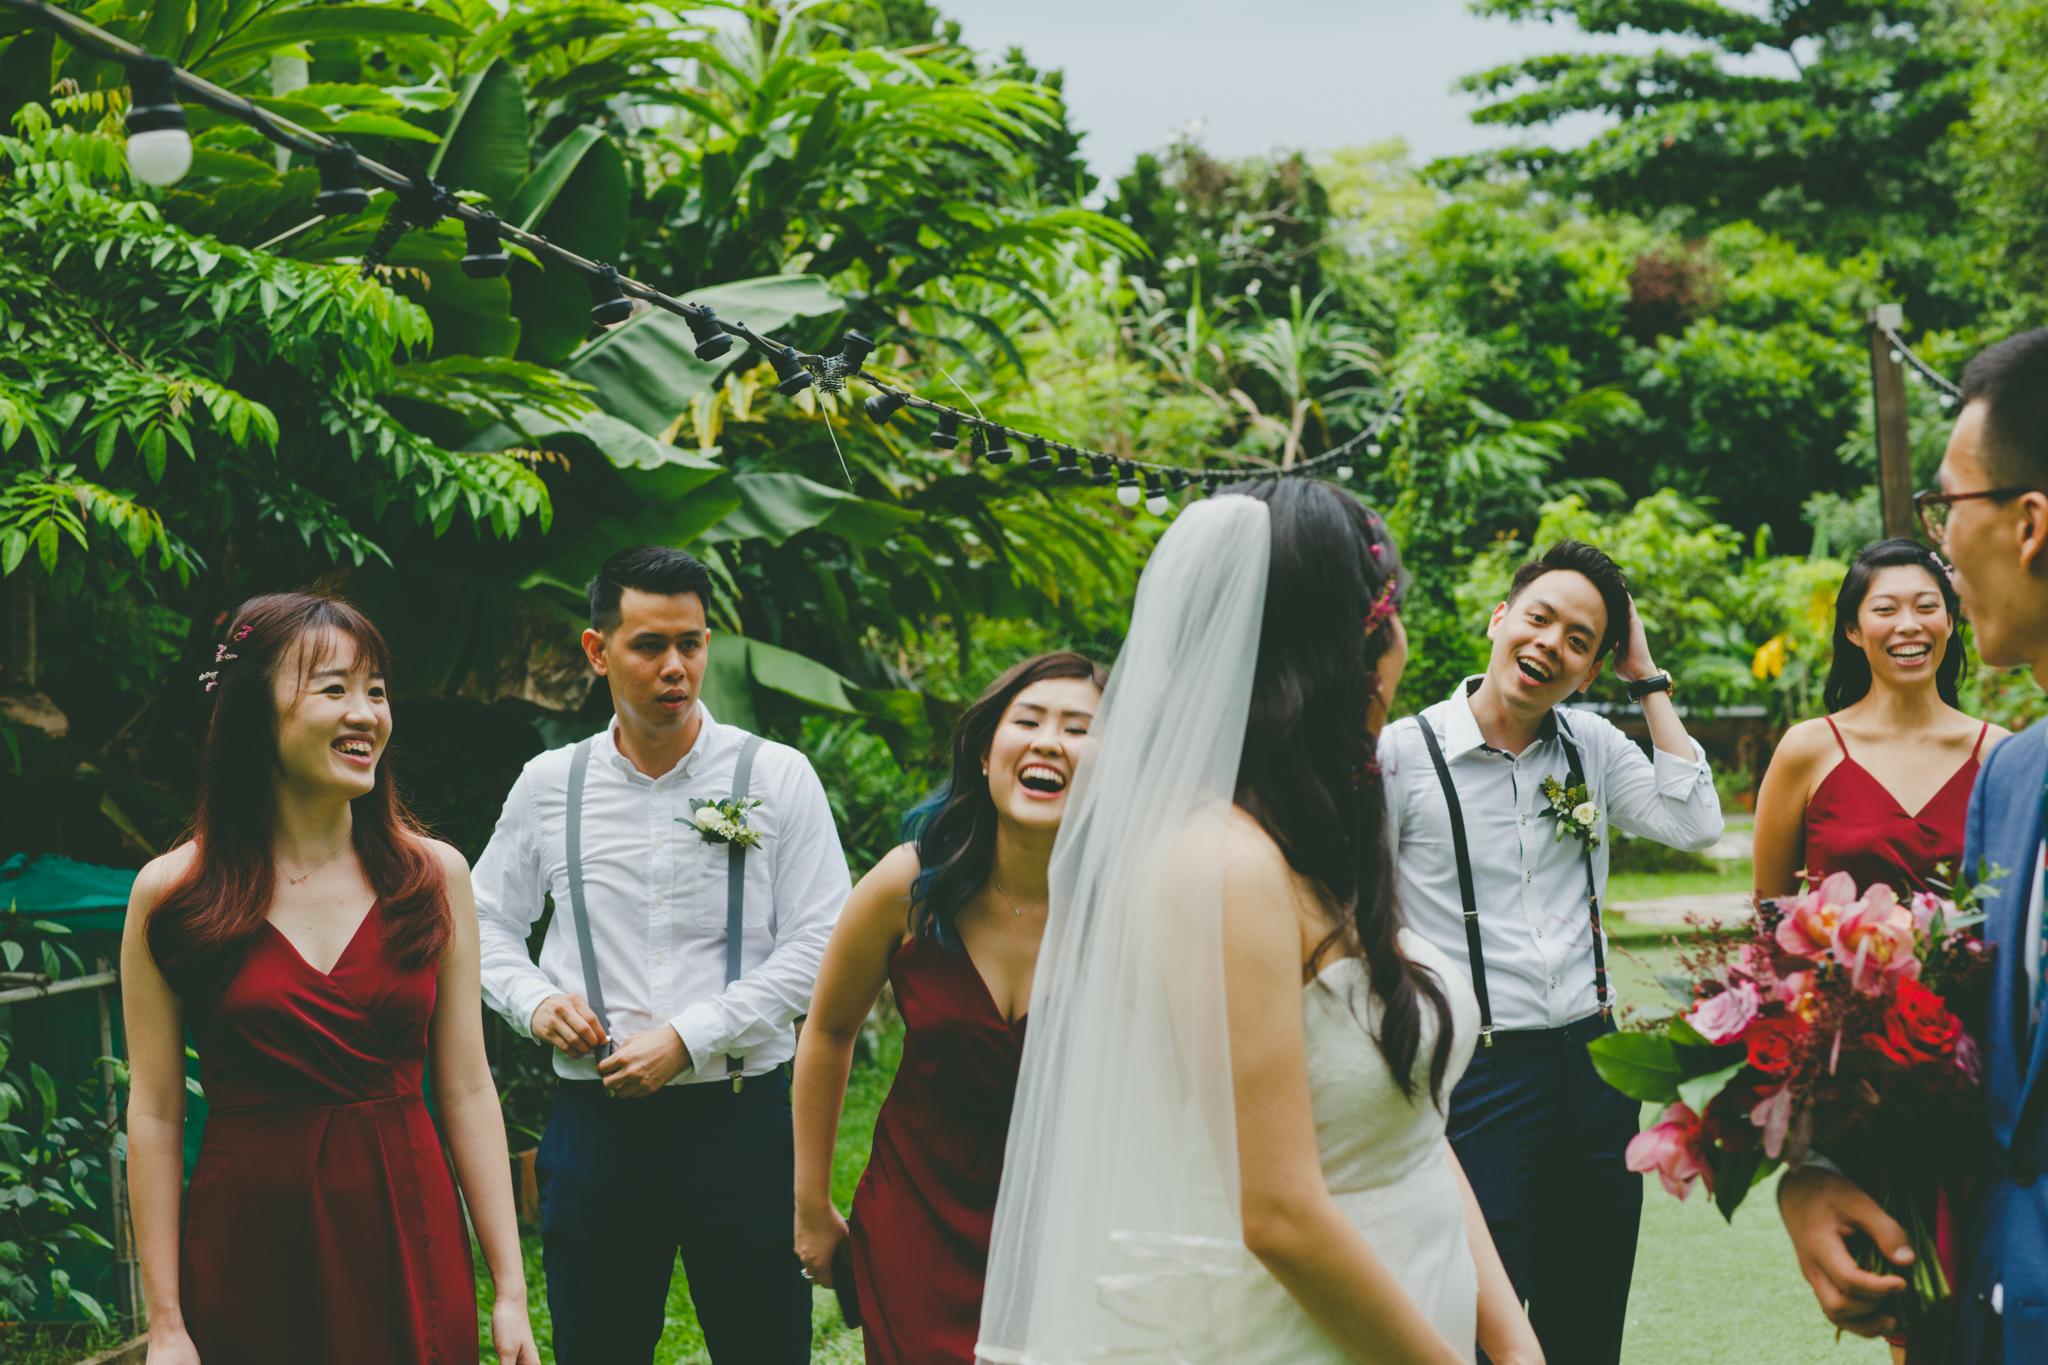 Devon and Cornwall Based Wedding Photographer Amy Sampson   Singapore Destination Wedding